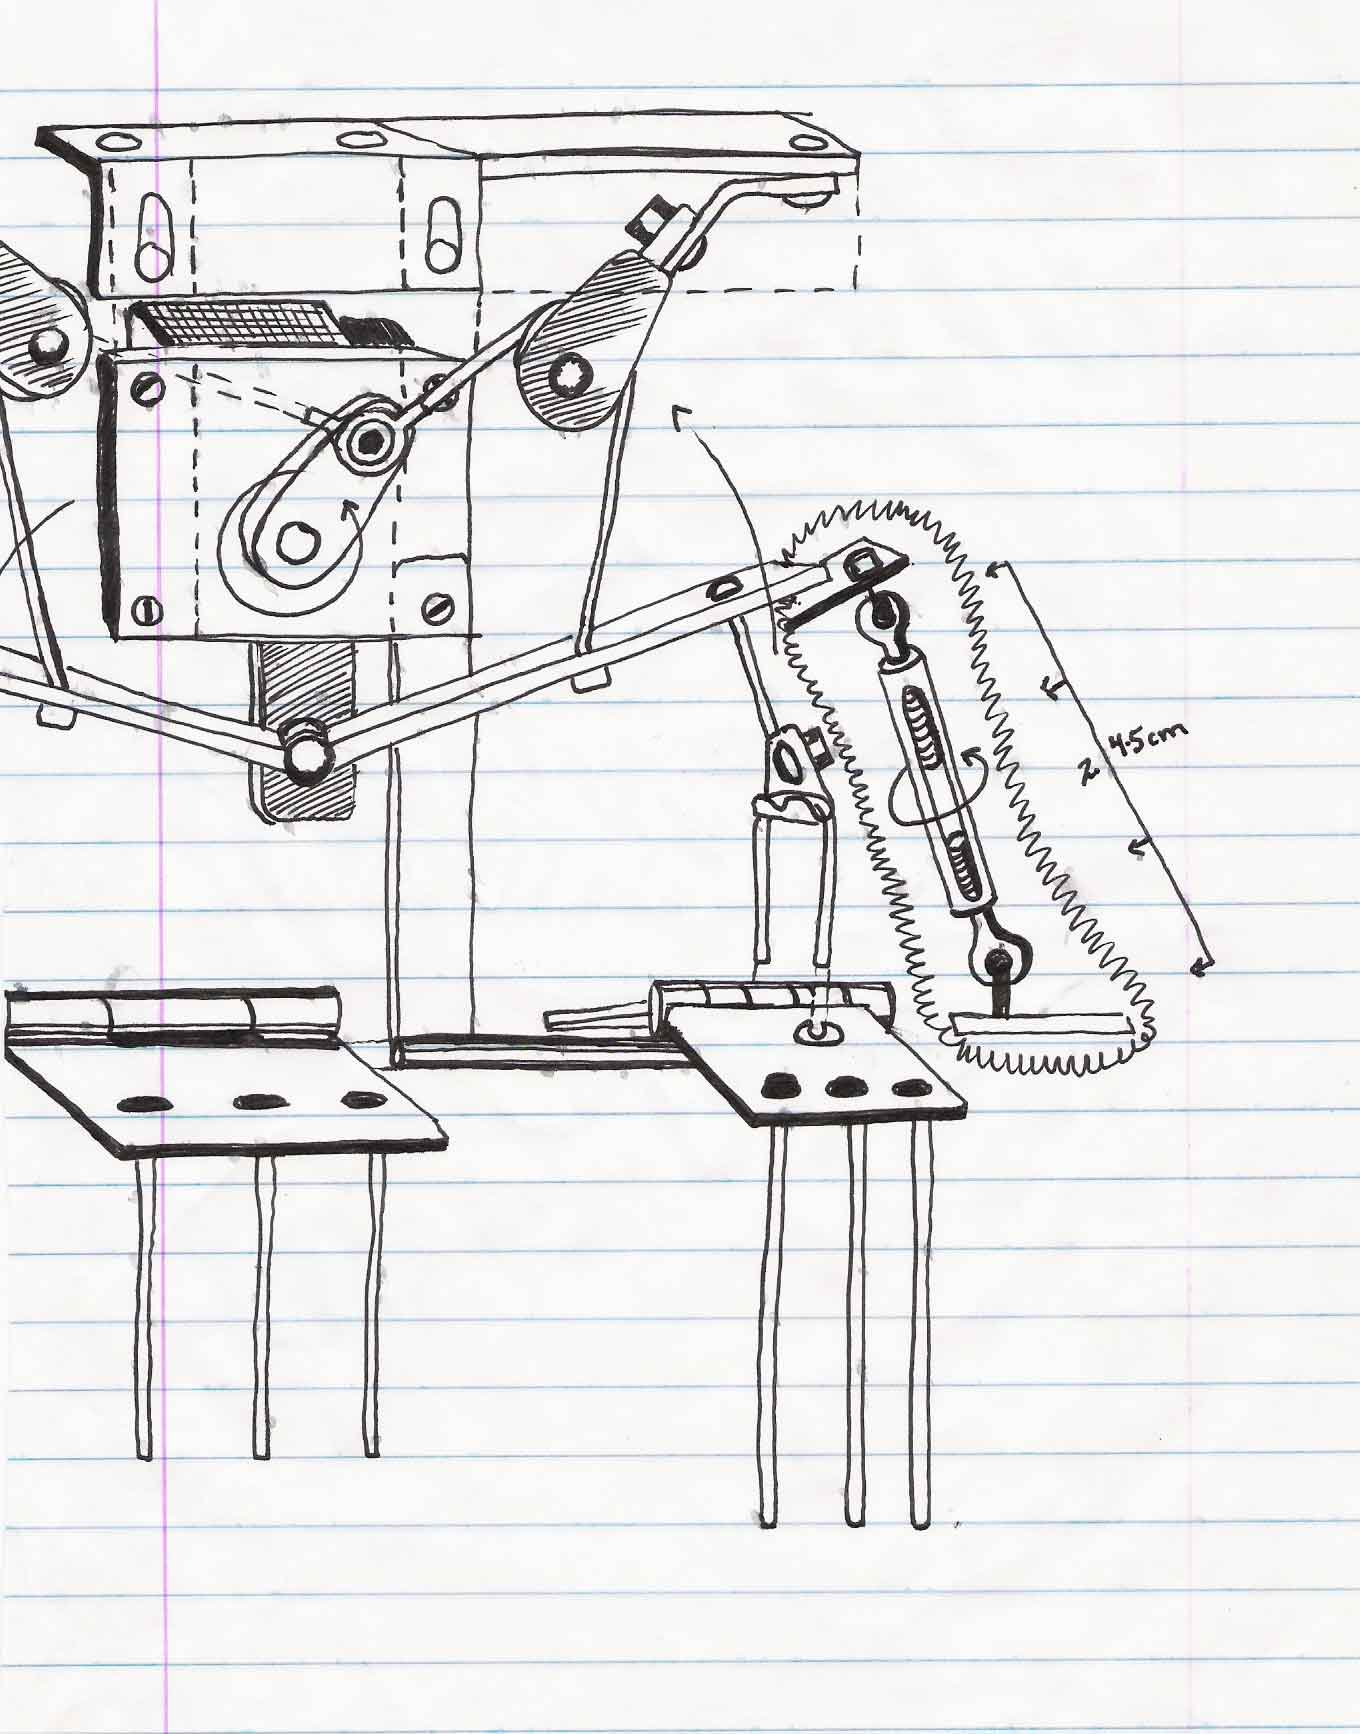 sketch-42-sept-05.jpg